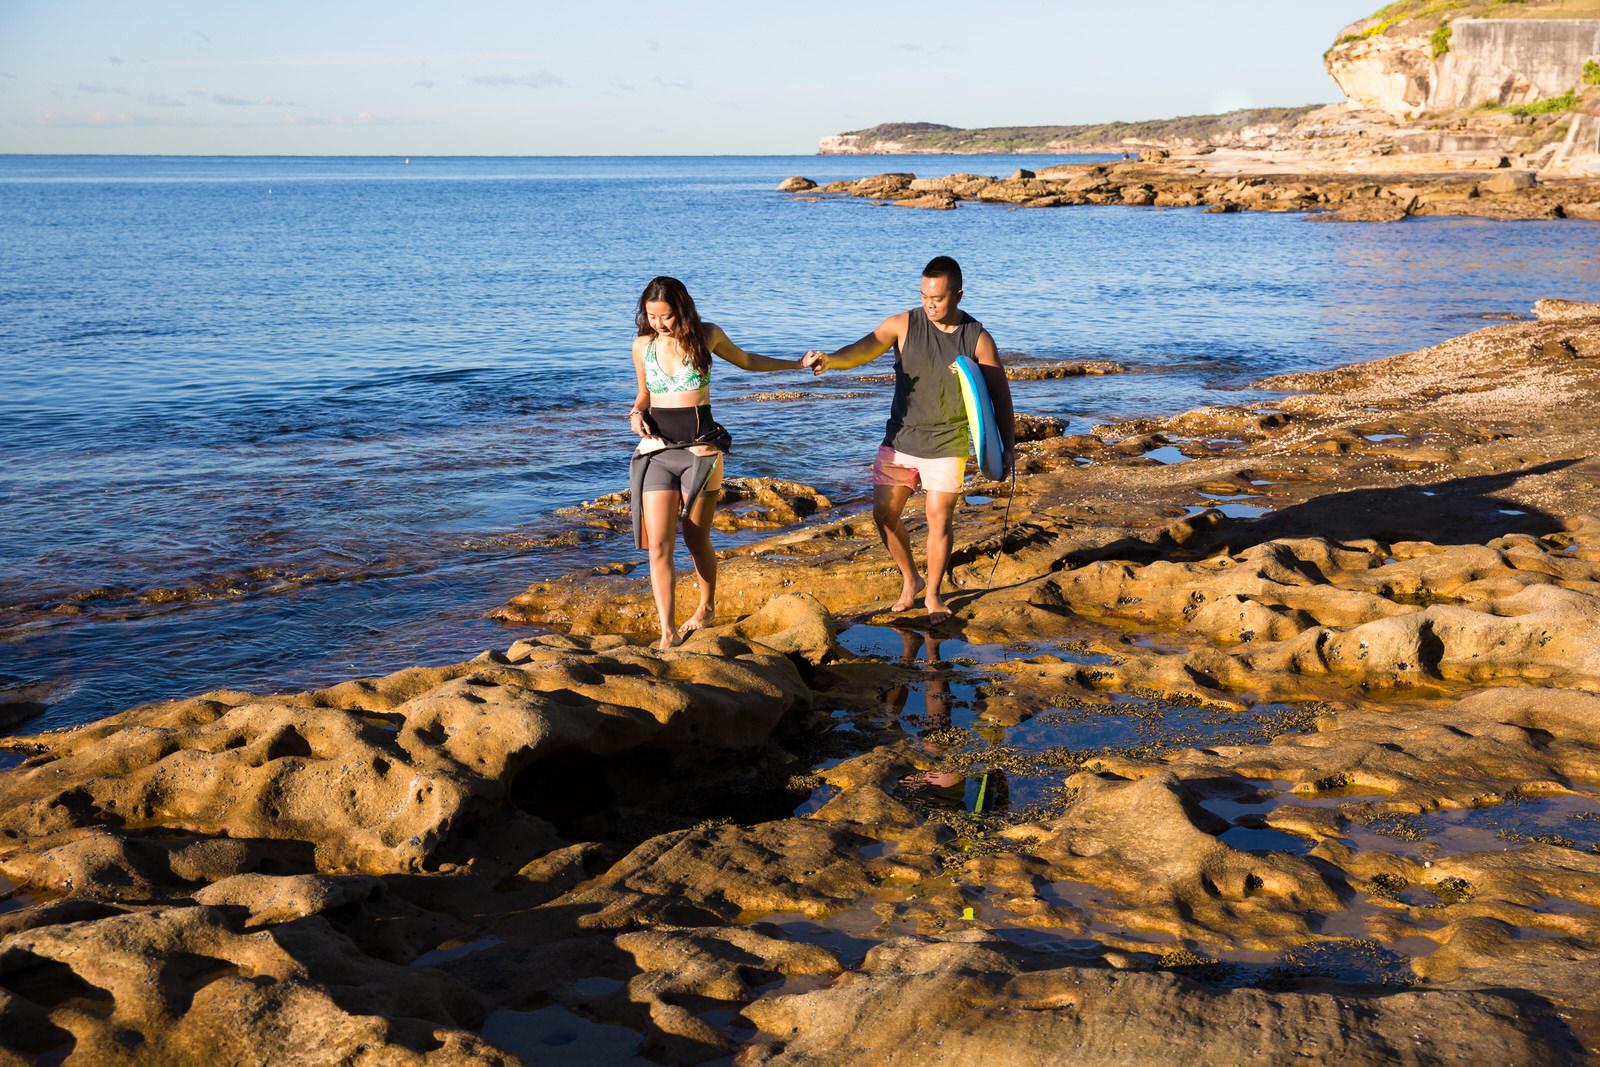 Sydney Engagement Pre-Wedding Photography Session - Jennifer Lam Photography - La Perouse (30).jpg